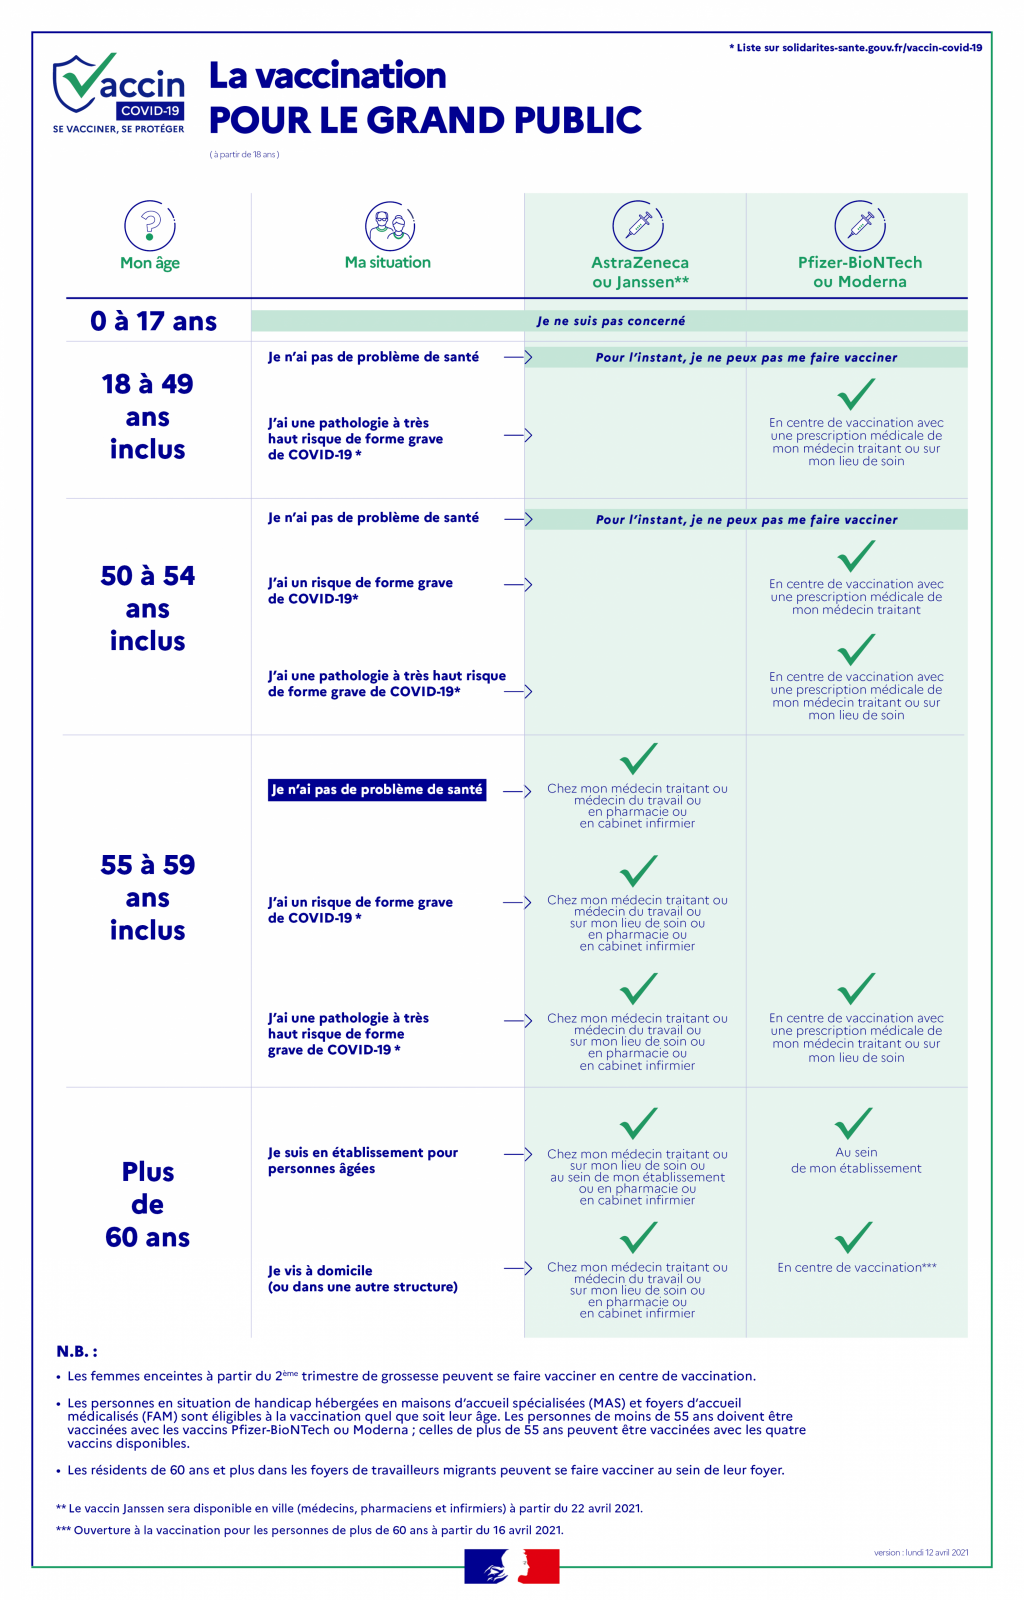 covid Qui peut se faire vacciner avril 21 - 173147607_4201015599918109_4092429971250784597_n.jpg